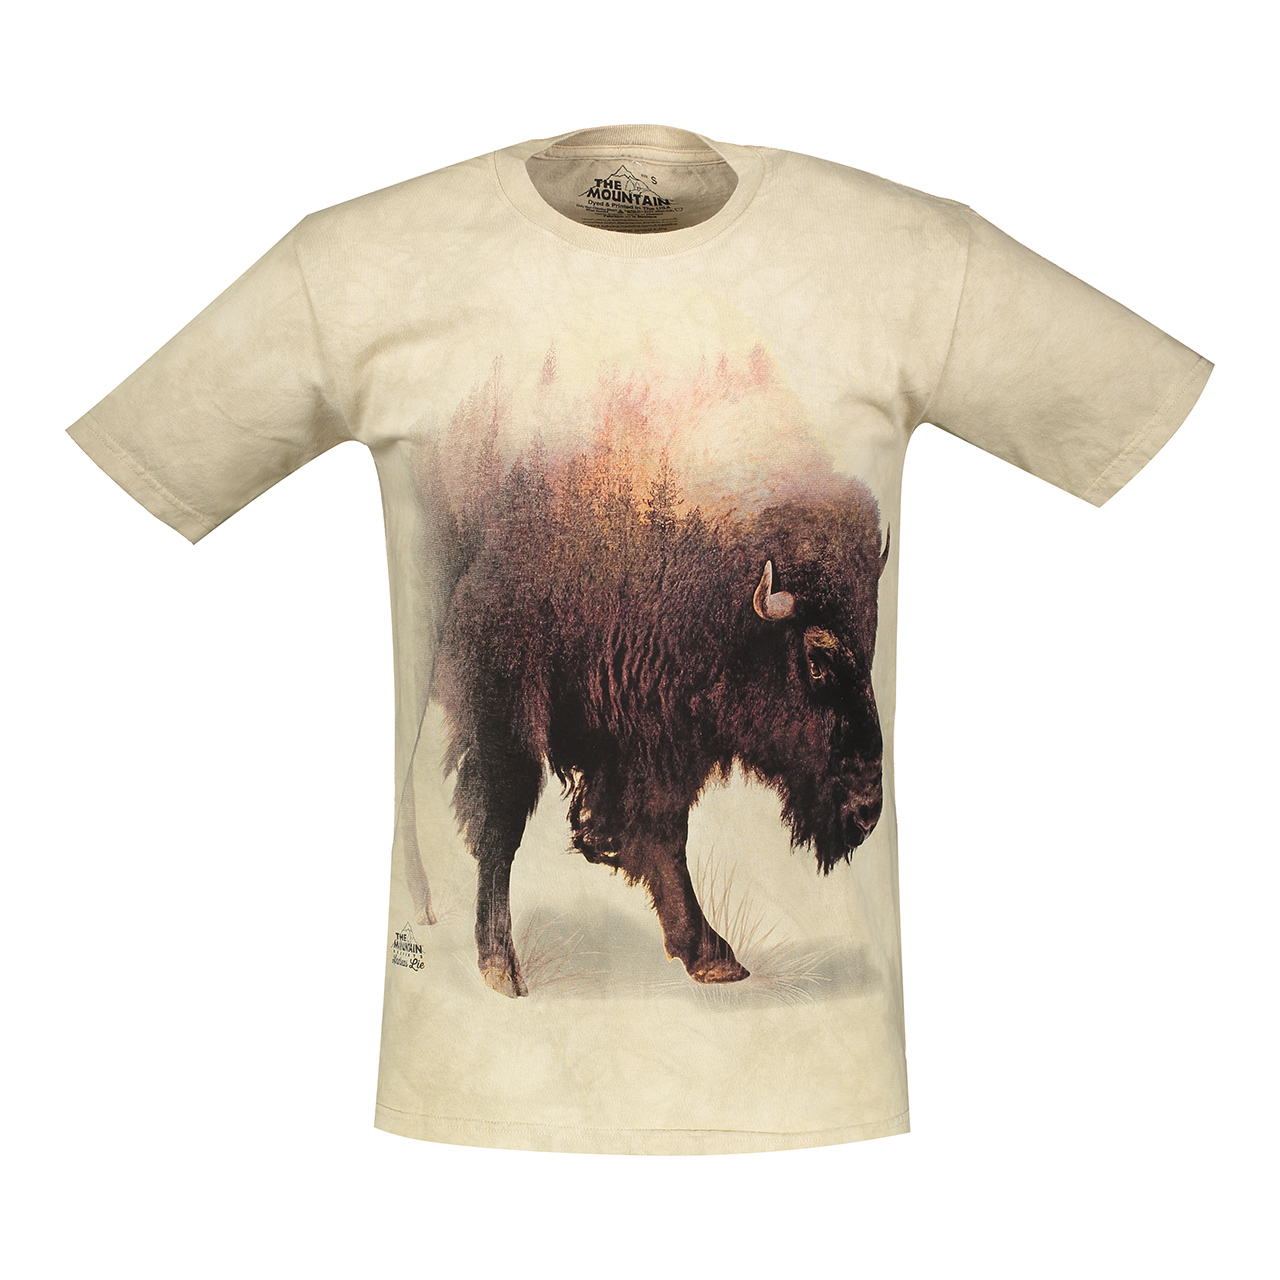 تی شرت مردانه د ماونتین مدل 63